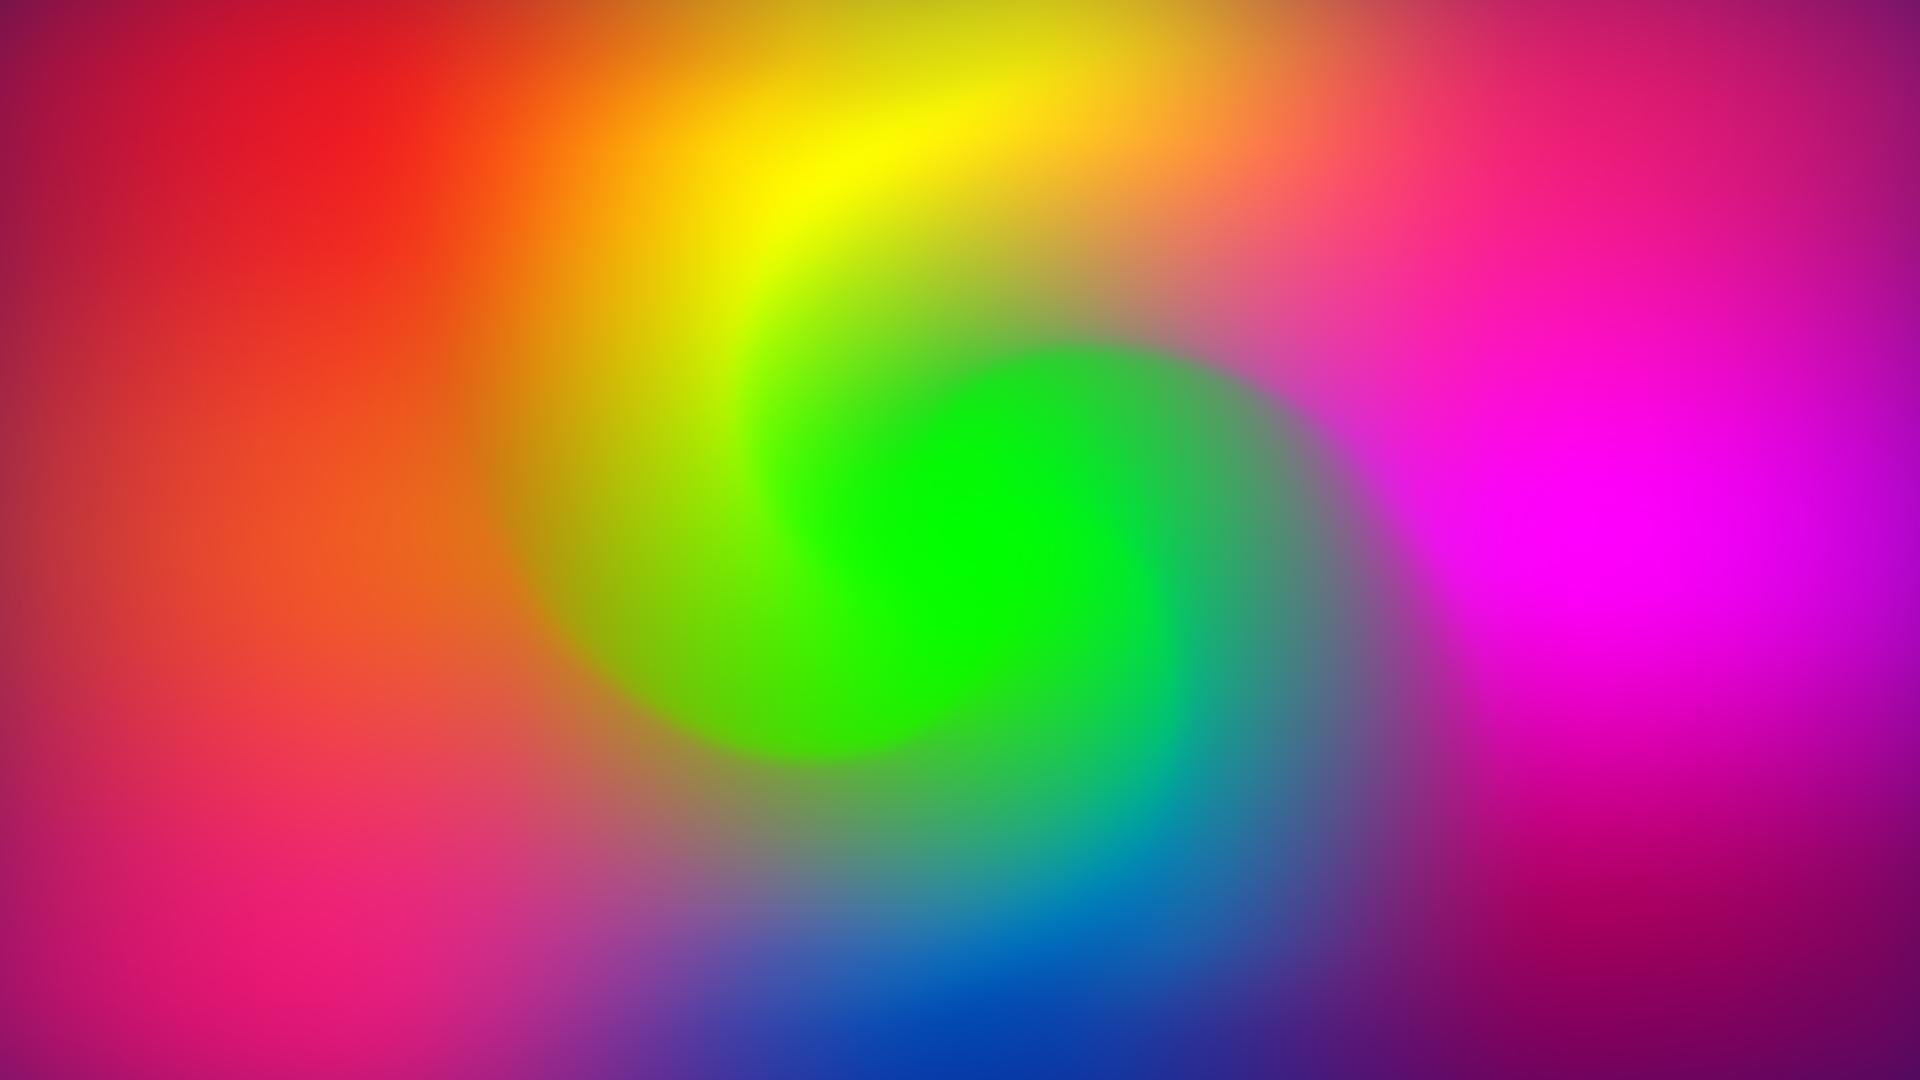 Image ID: 359281